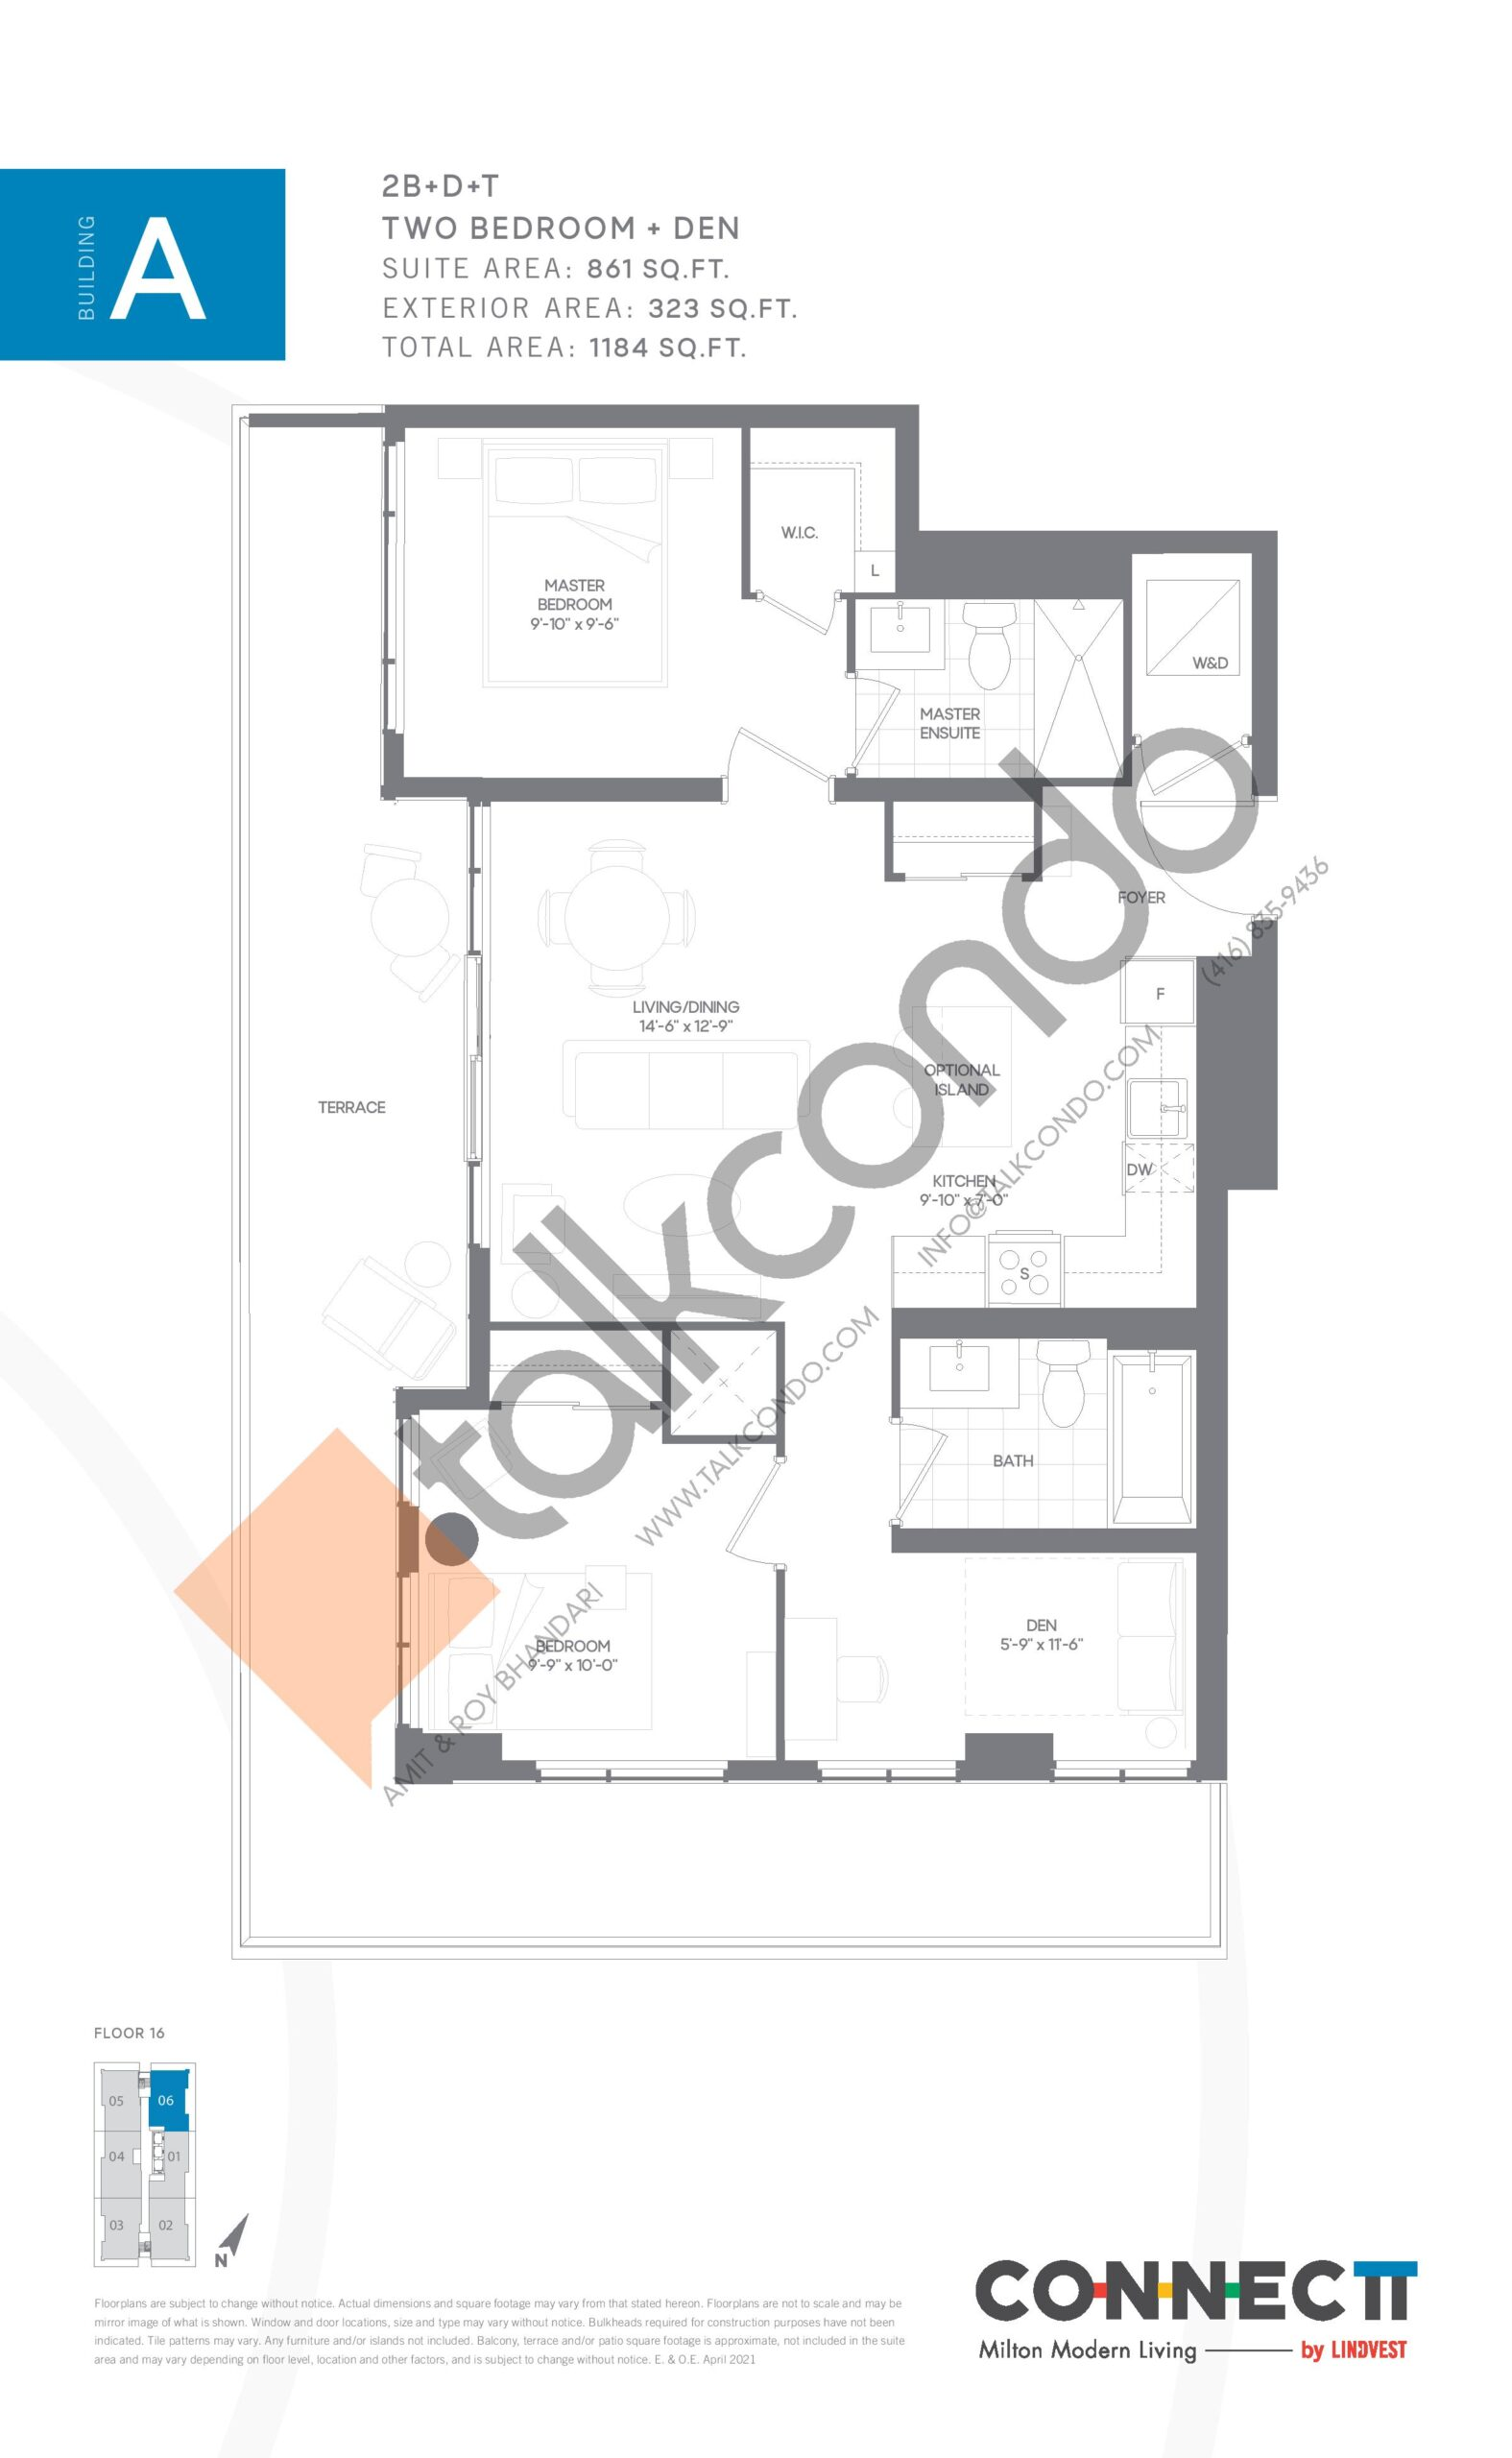 2B+D+T Floor Plan at Connectt Urban Community Condos - 861 sq.ft